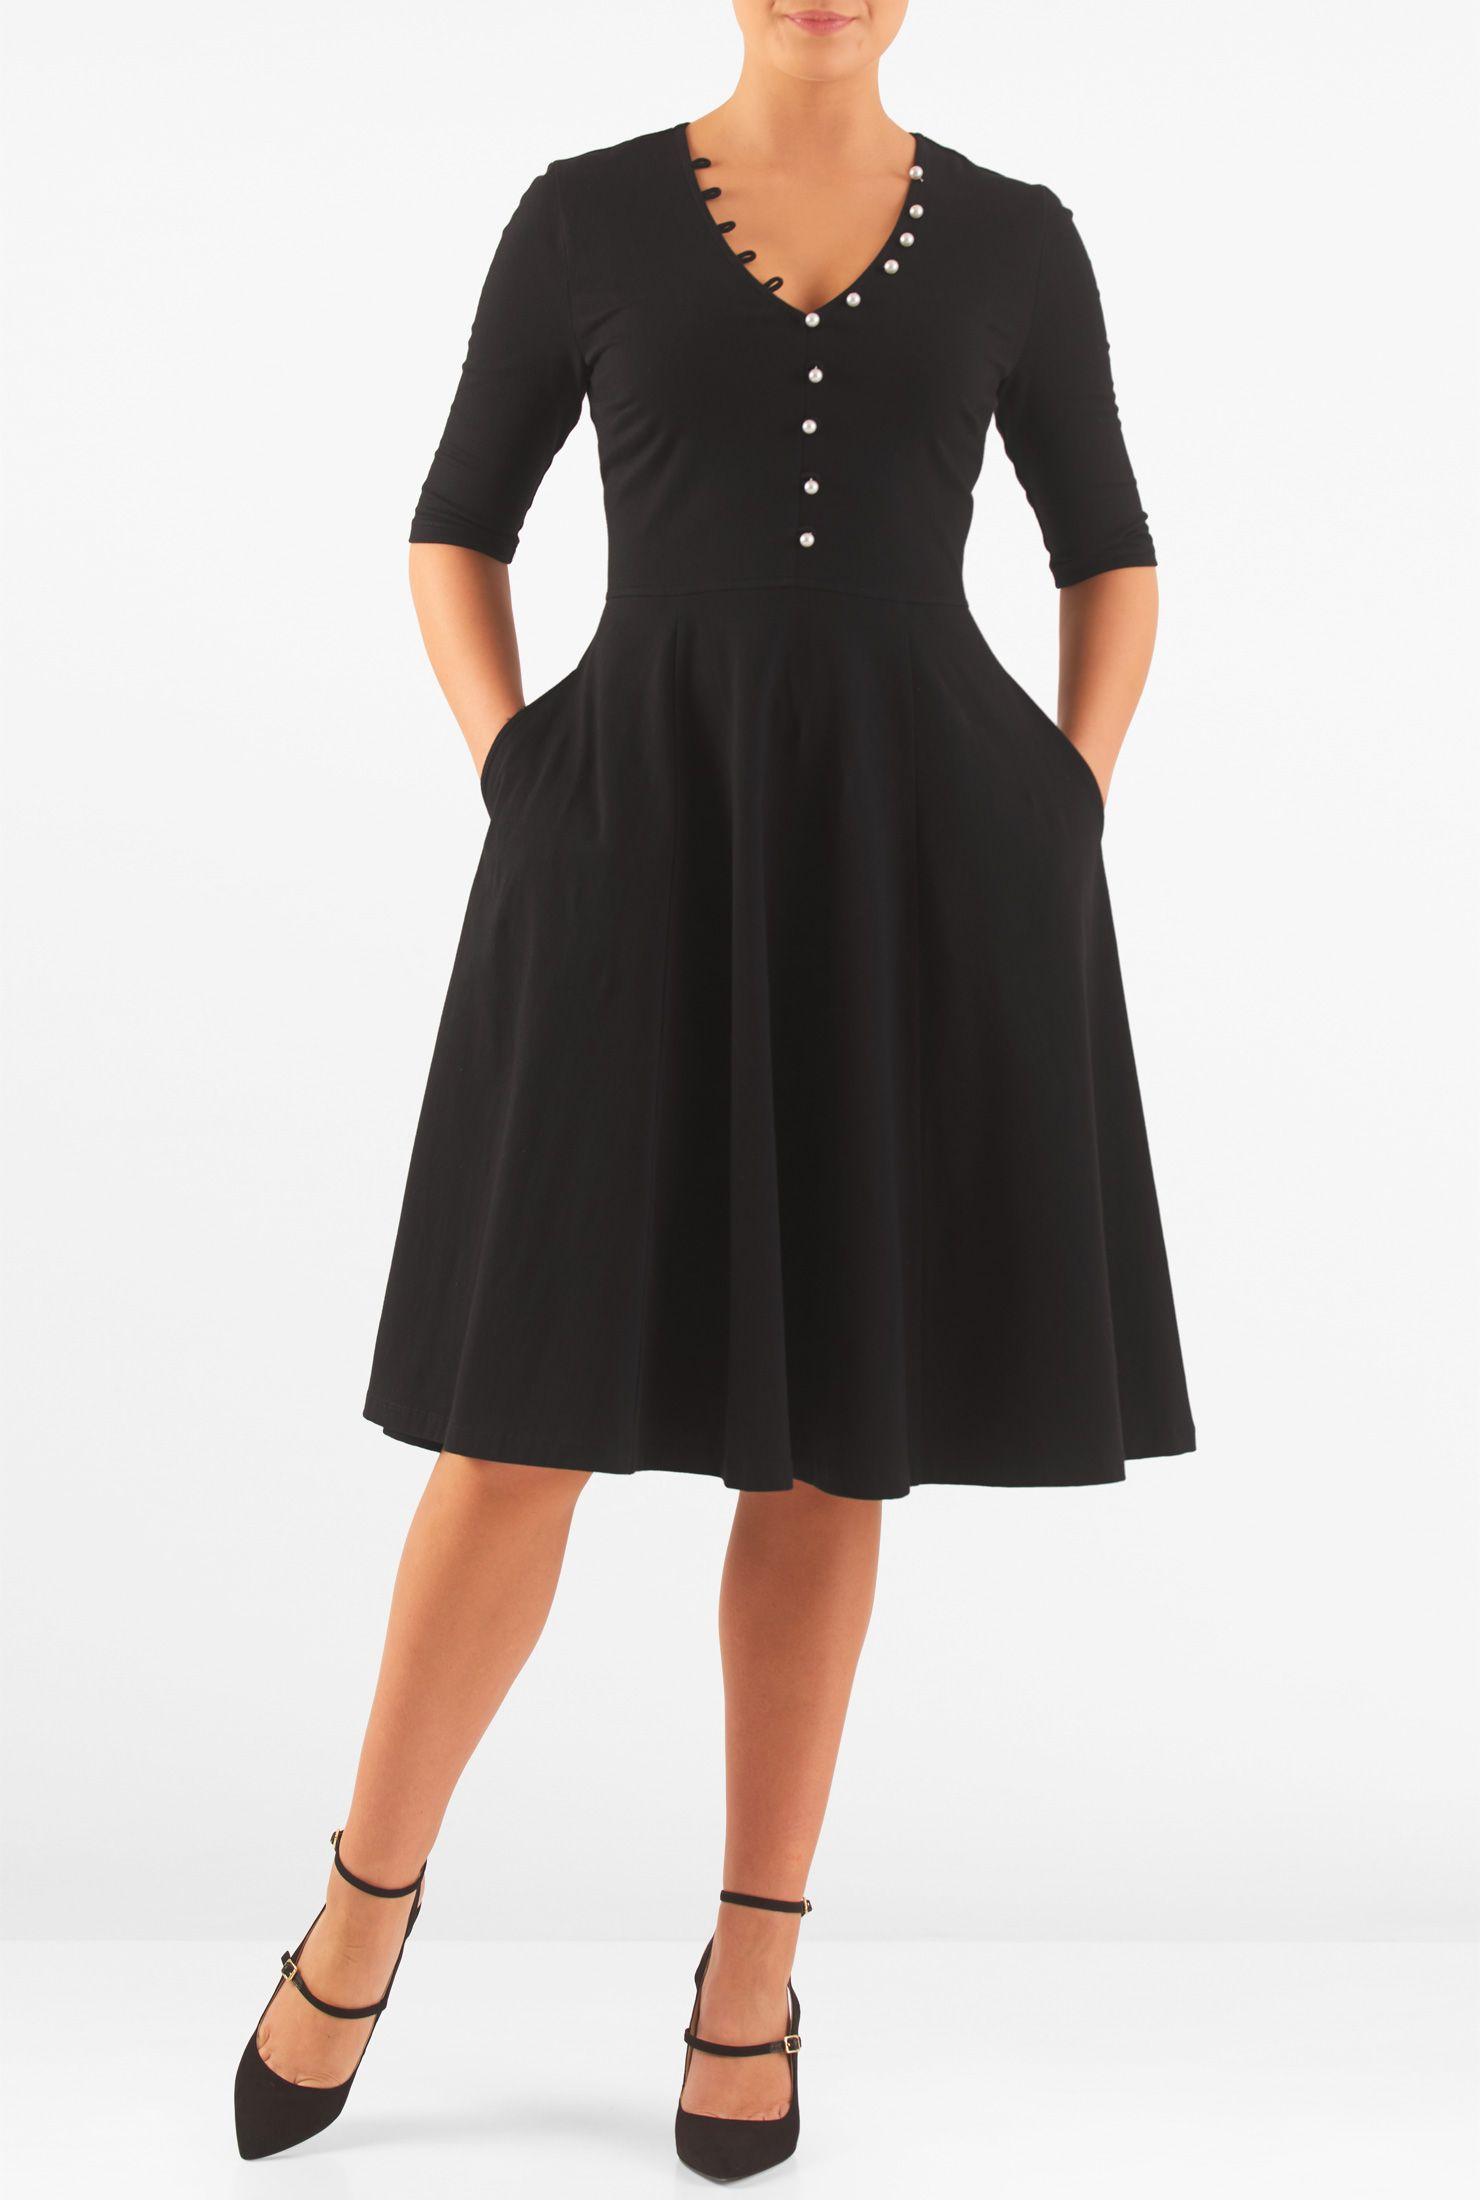 Elbow Length Dresses